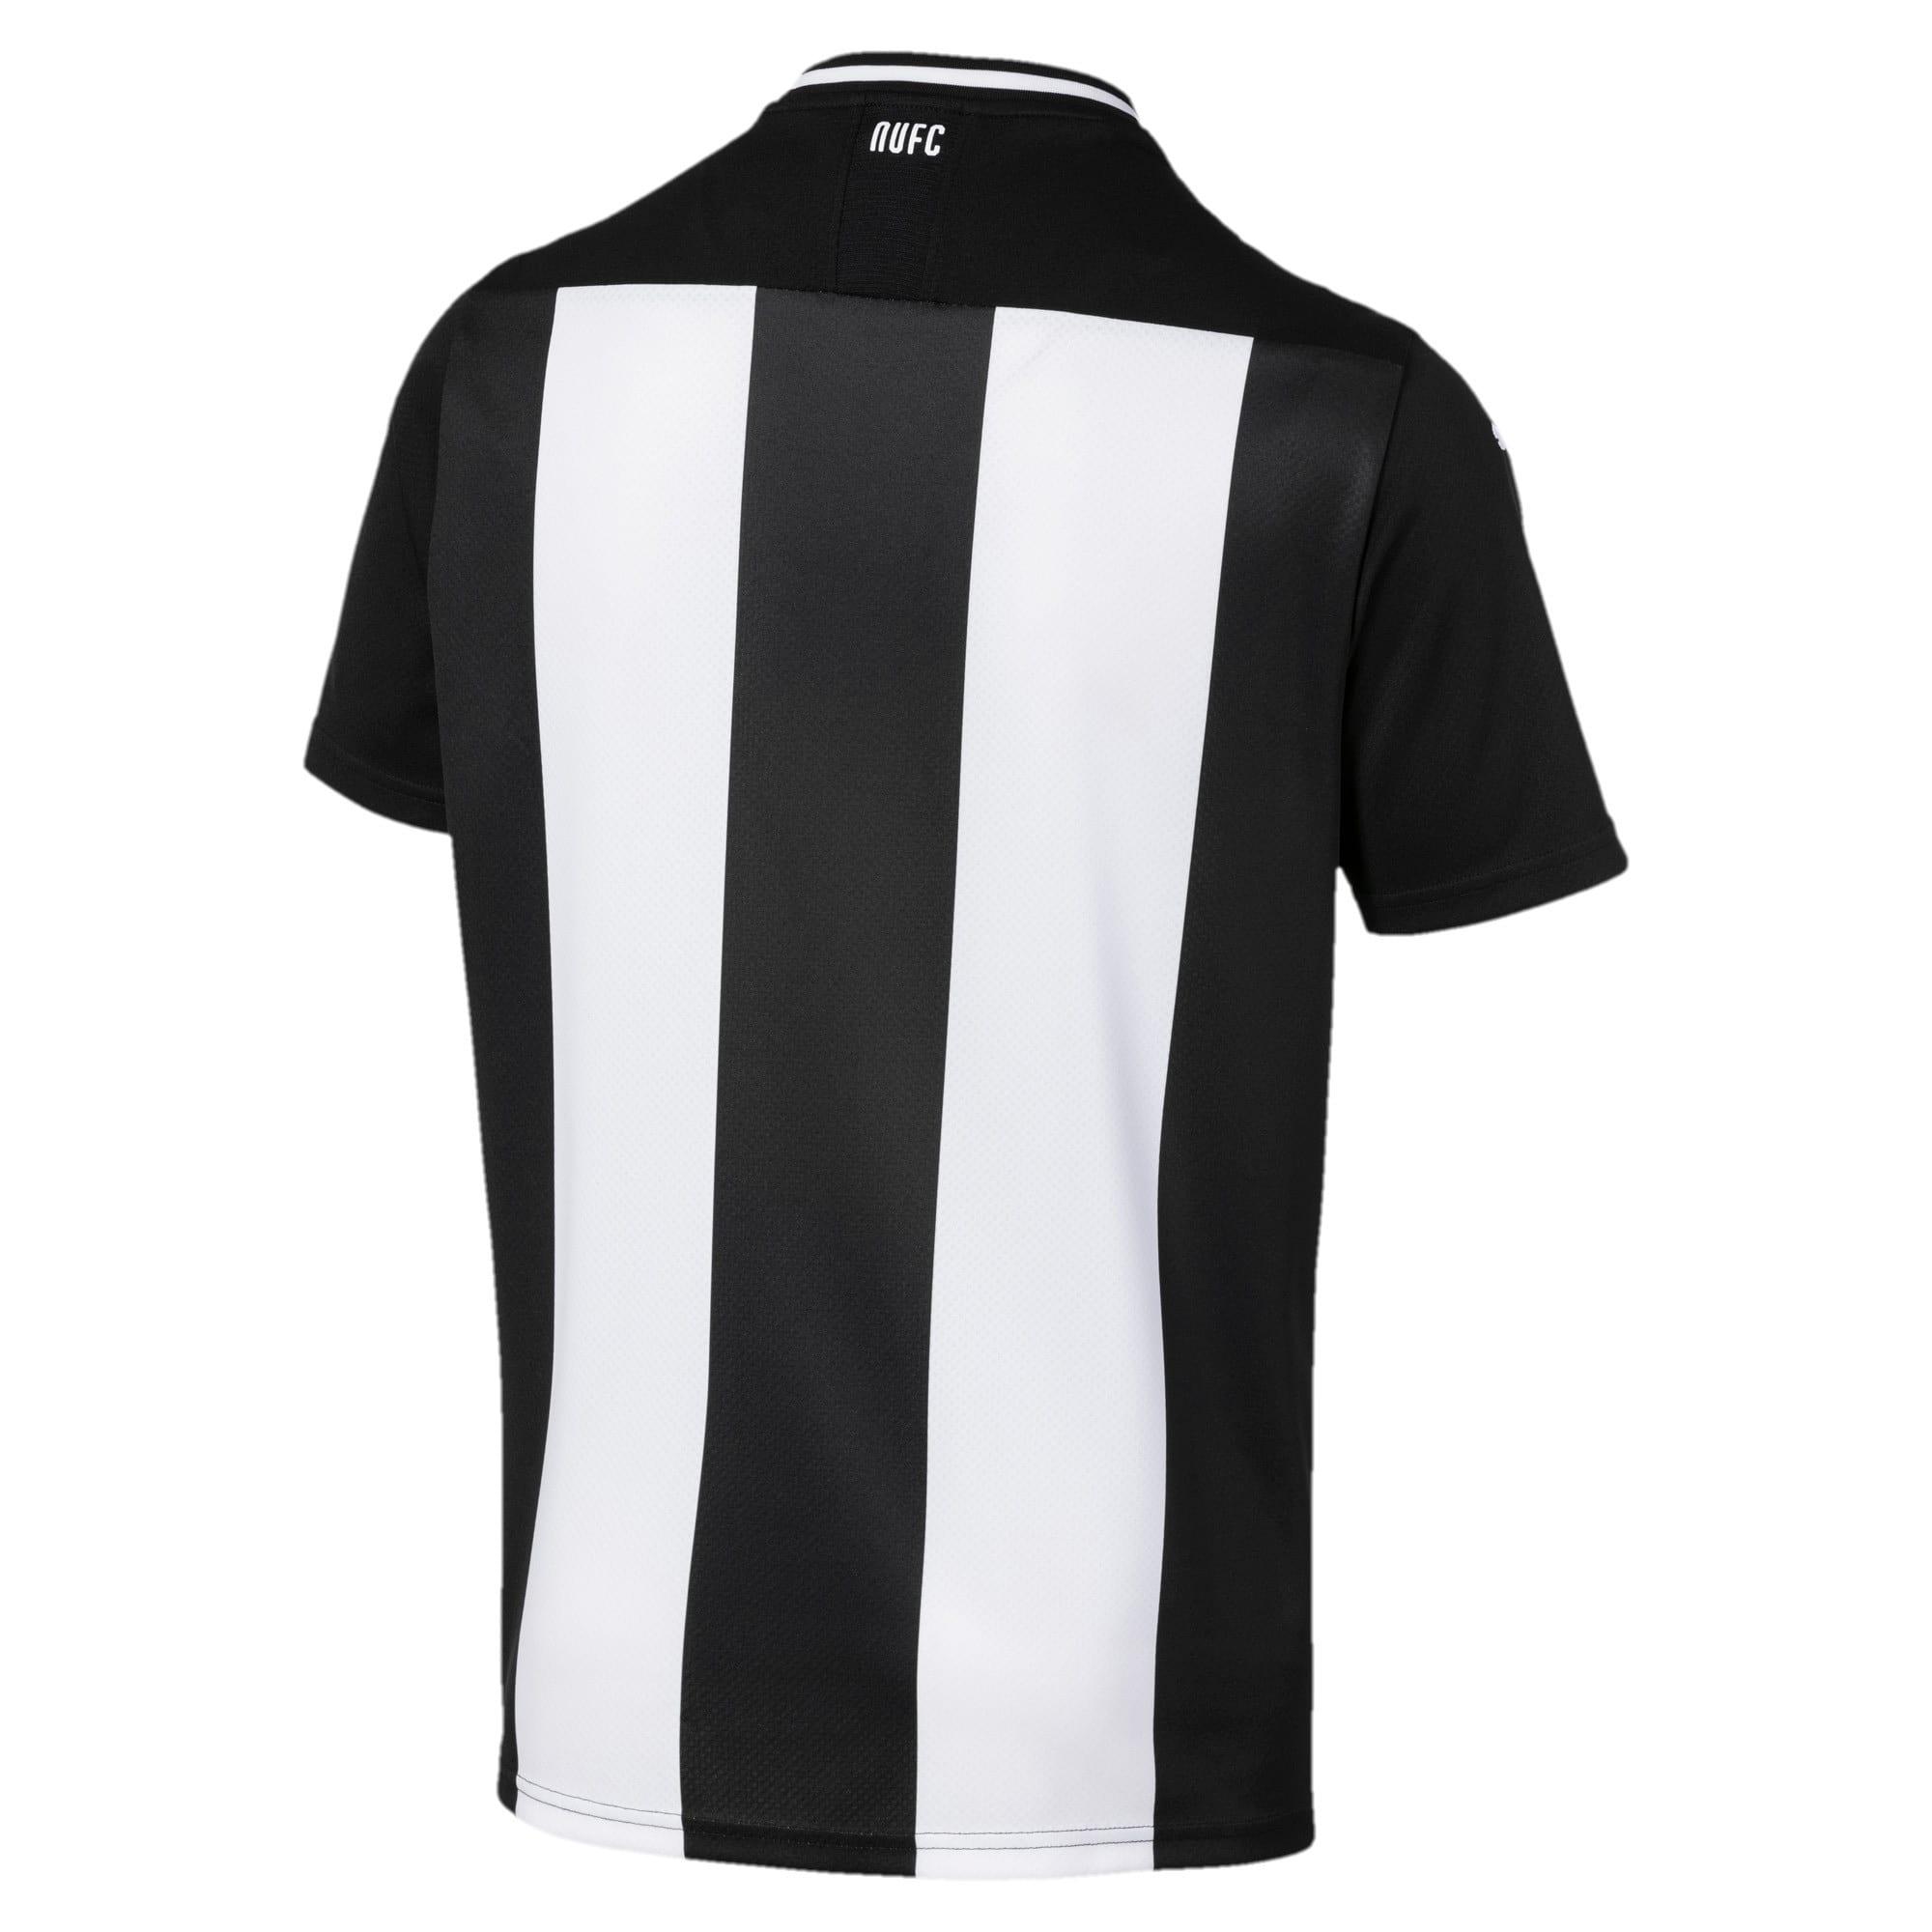 Thumbnail 2 van Newcastle United FC replica-thuisshirt voor mannen, Puma wit-Puma zwart, medium